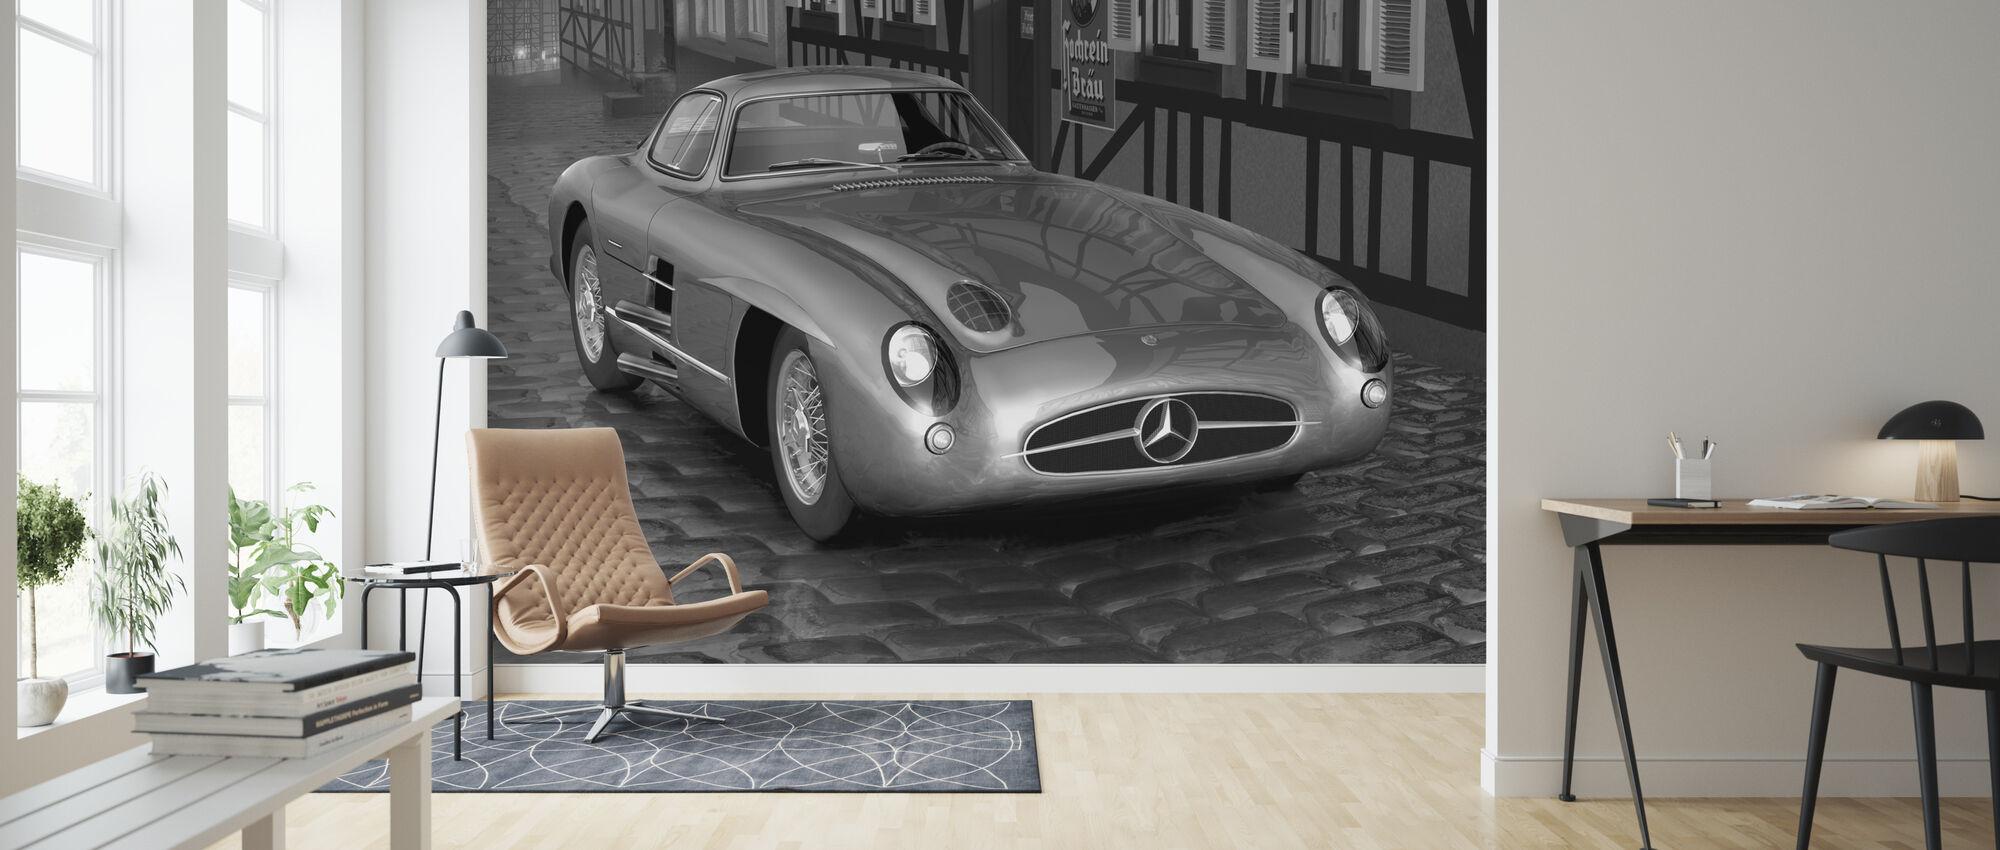 Shiny 300 BW - Wallpaper - Living Room